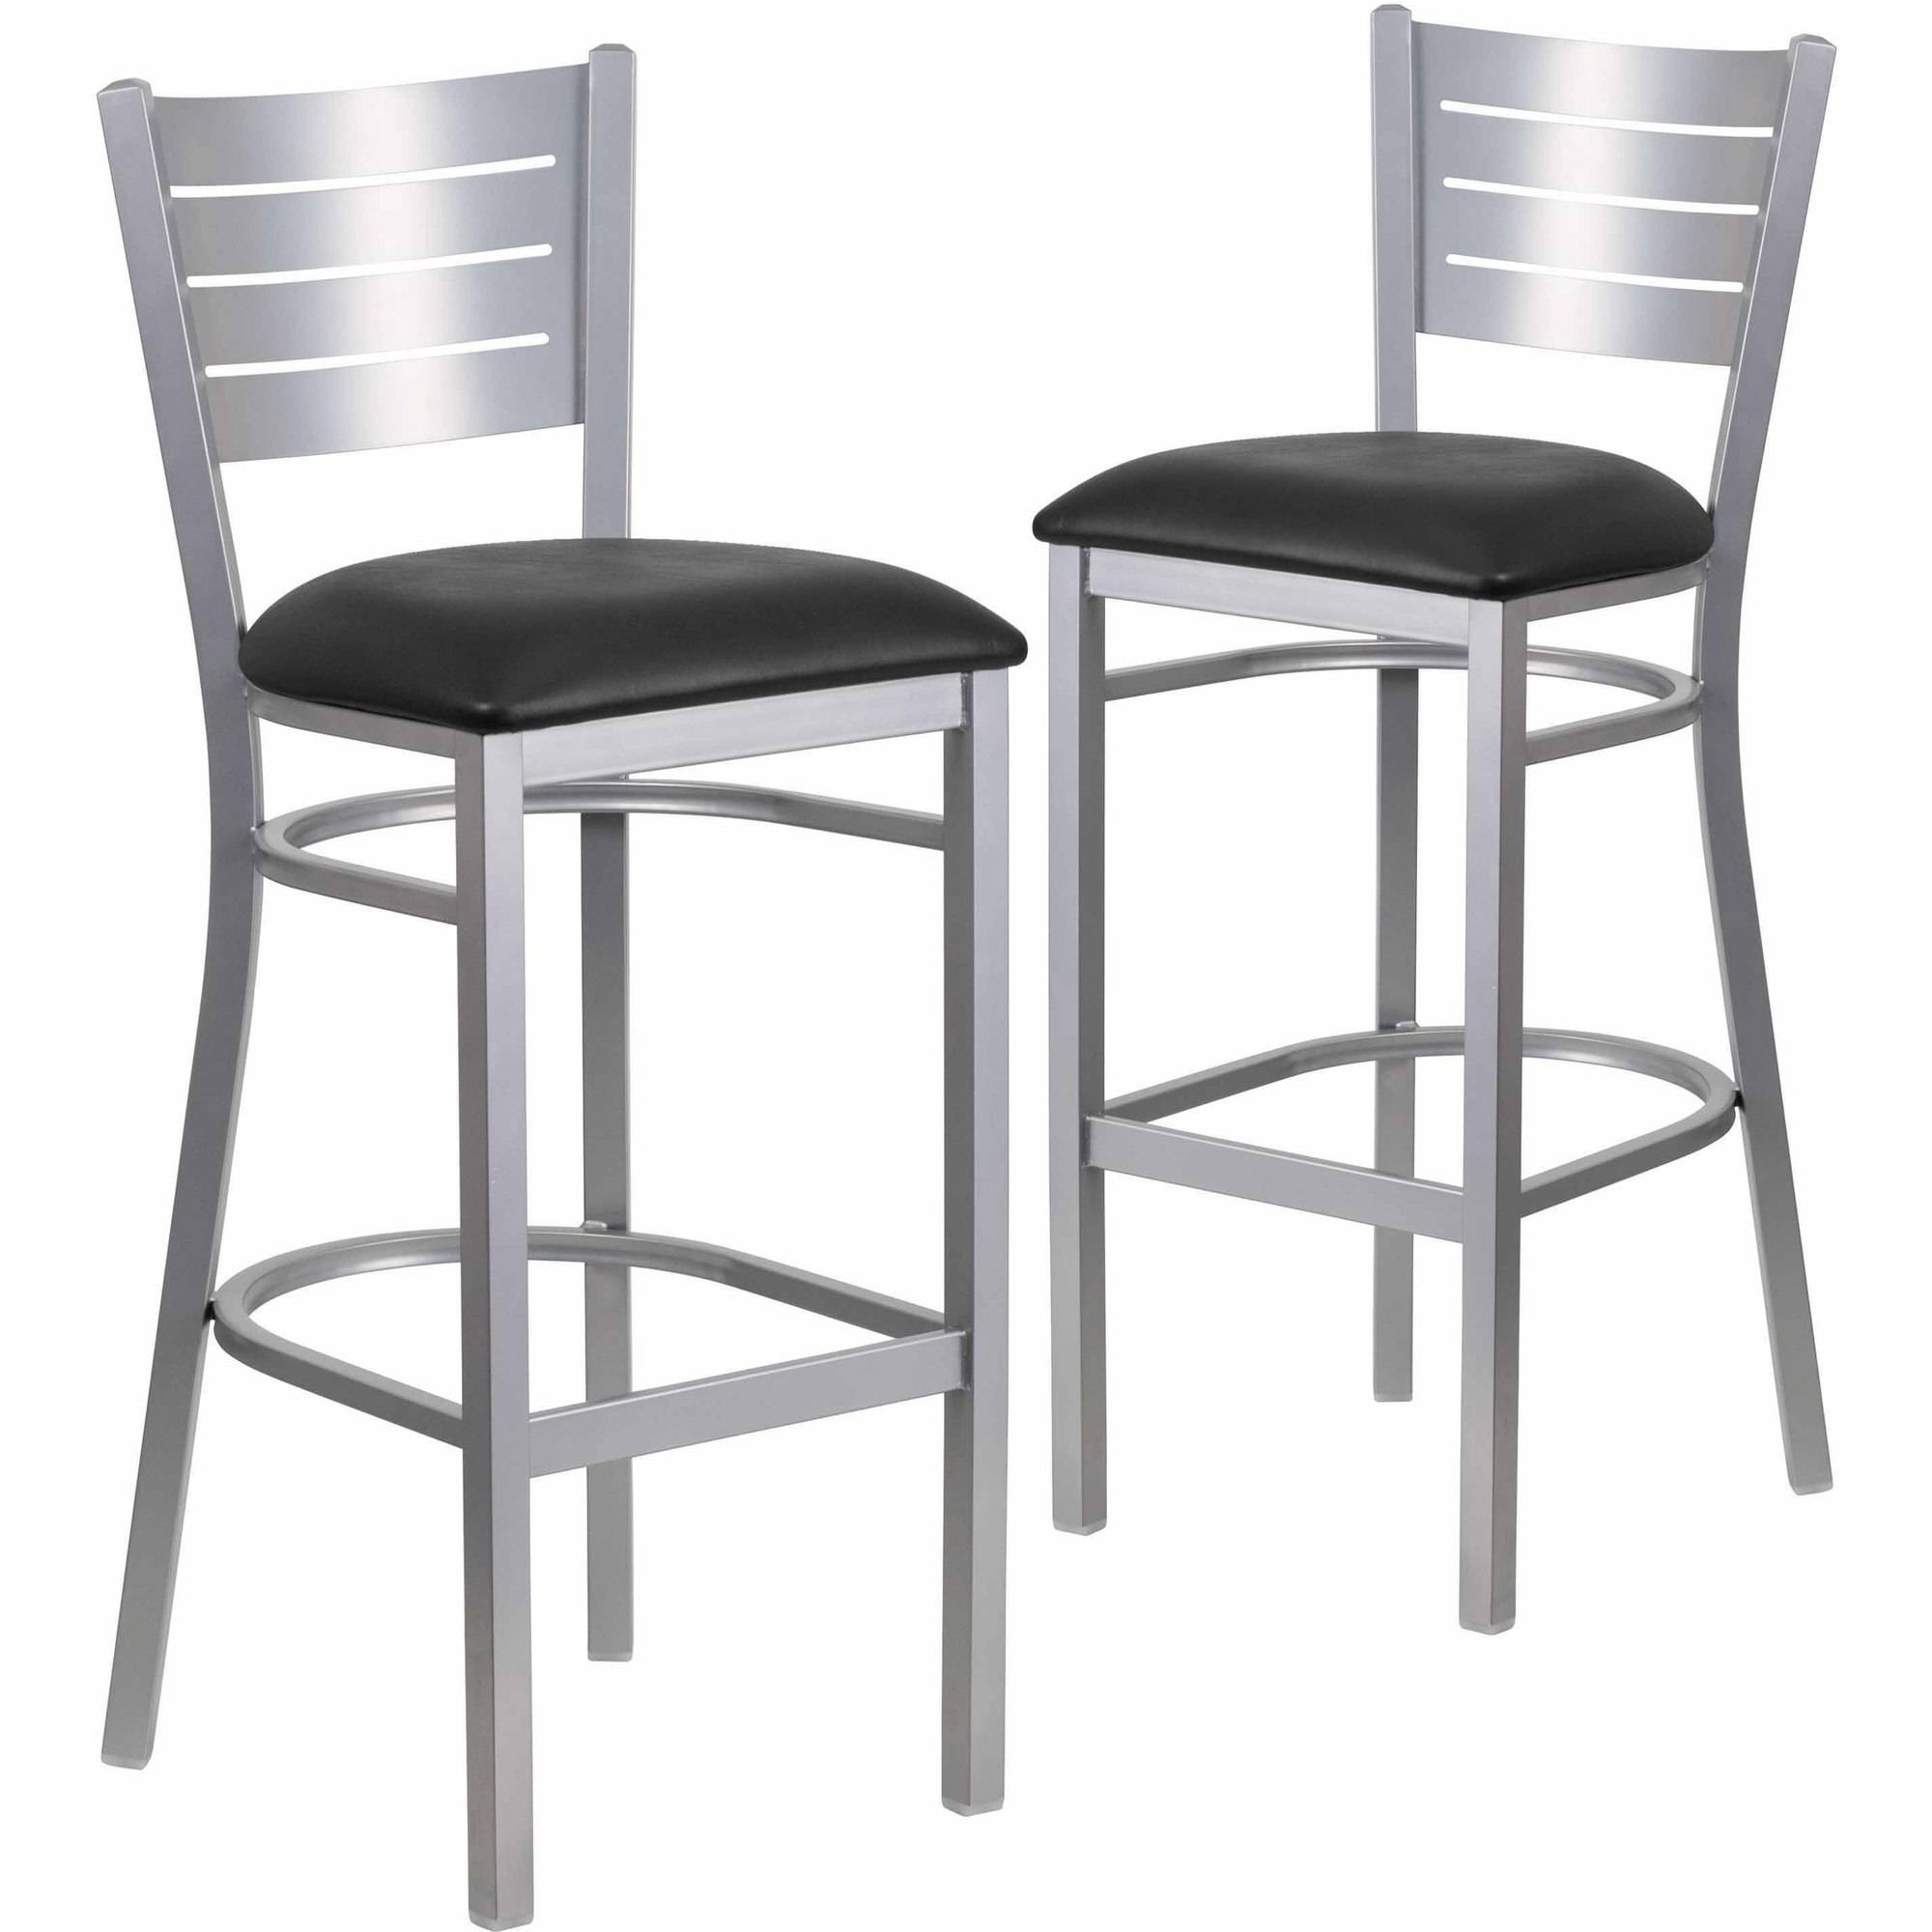 Flash Furniture 2-Pack HERCULES Series Silver Slat Back Metal Restaurant Barstool, Vinyl Seat, Multiple Colors